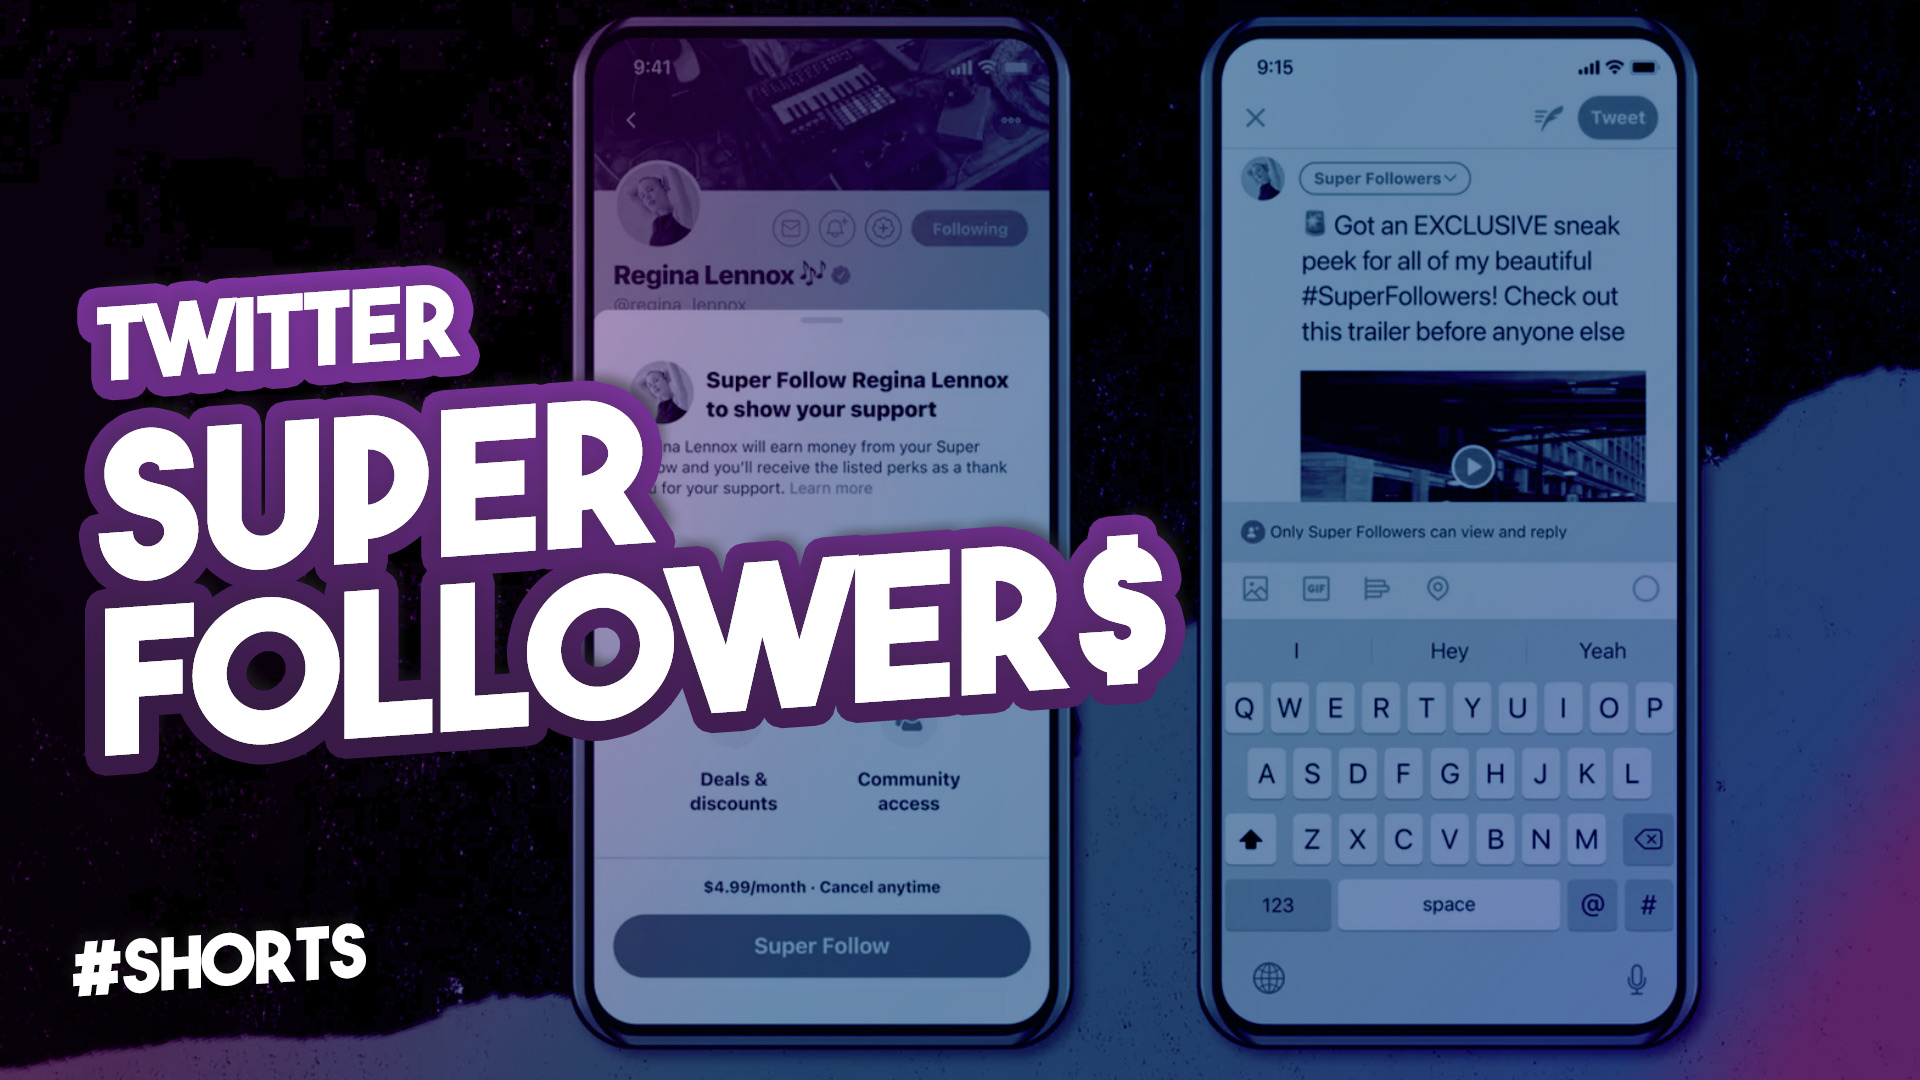 Twitter Super Follow – Comment monétiser son contenu Twitter 2021 #SHORTS